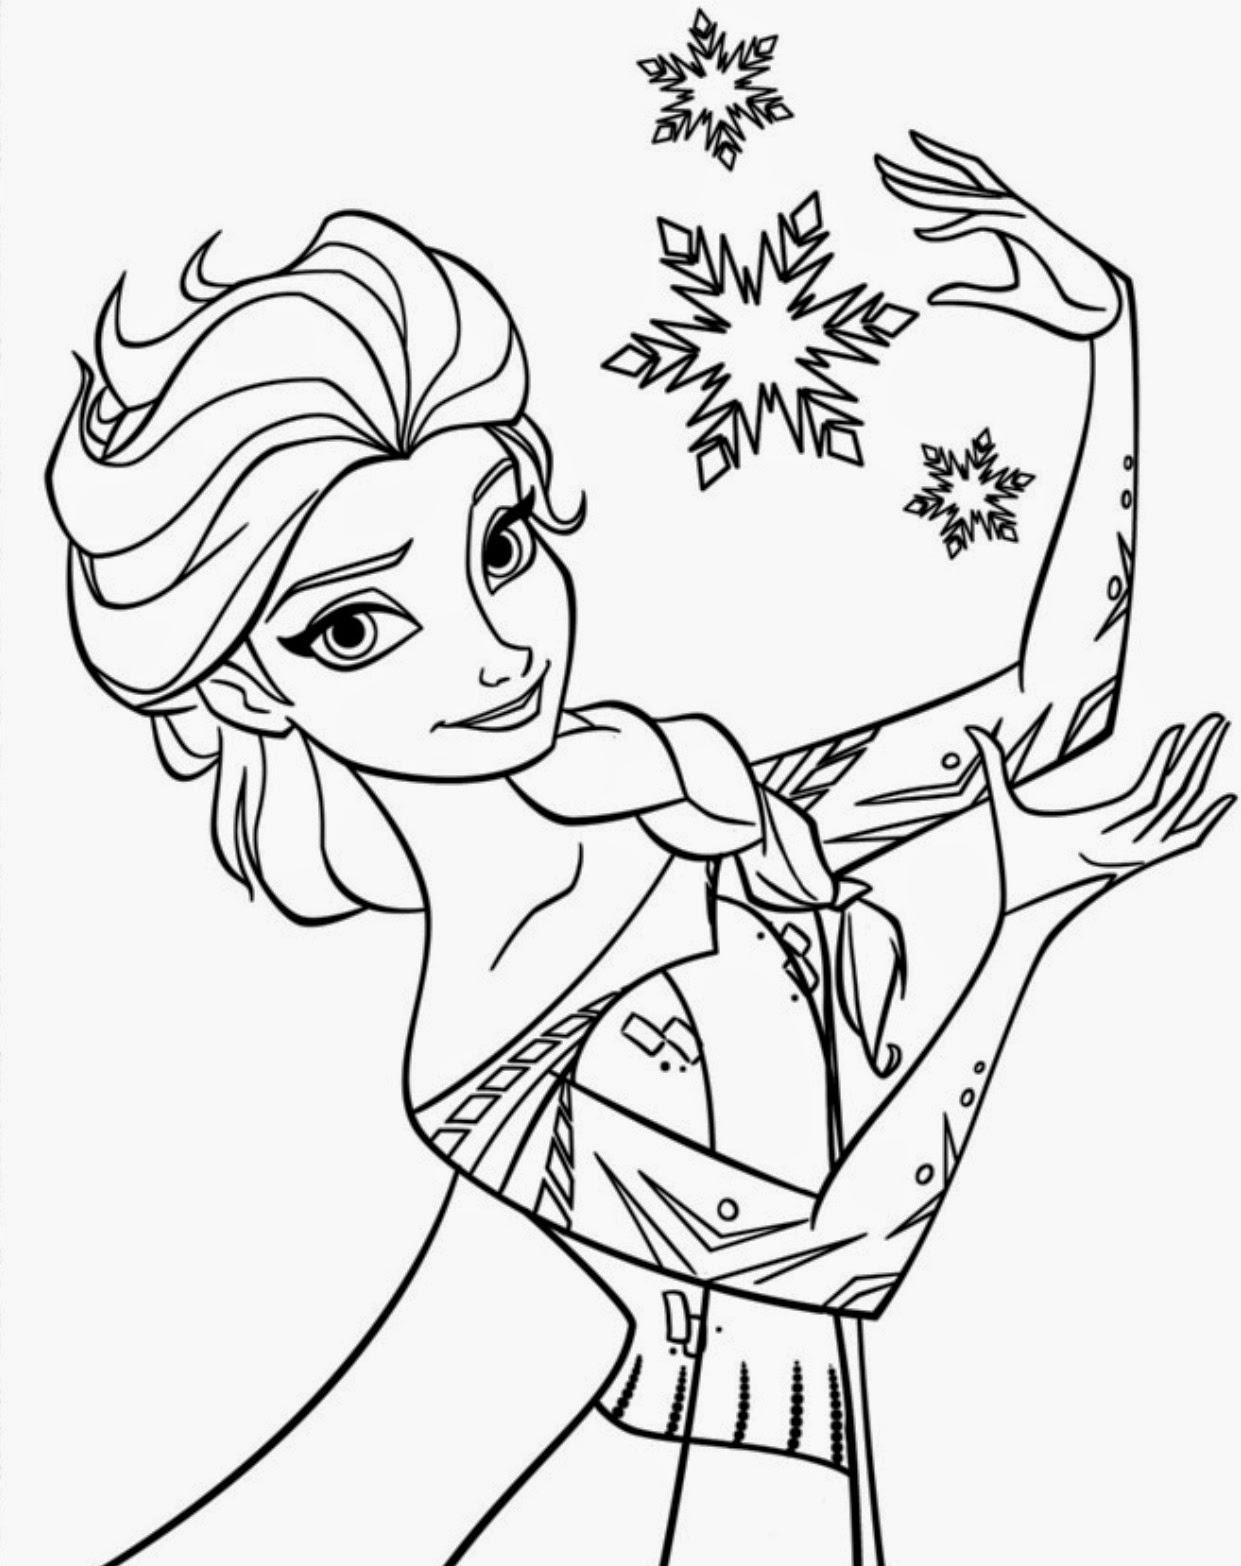 Desenhos de Frozen uma aventura congelante para colorir pintar imprimir ou preparar atividades